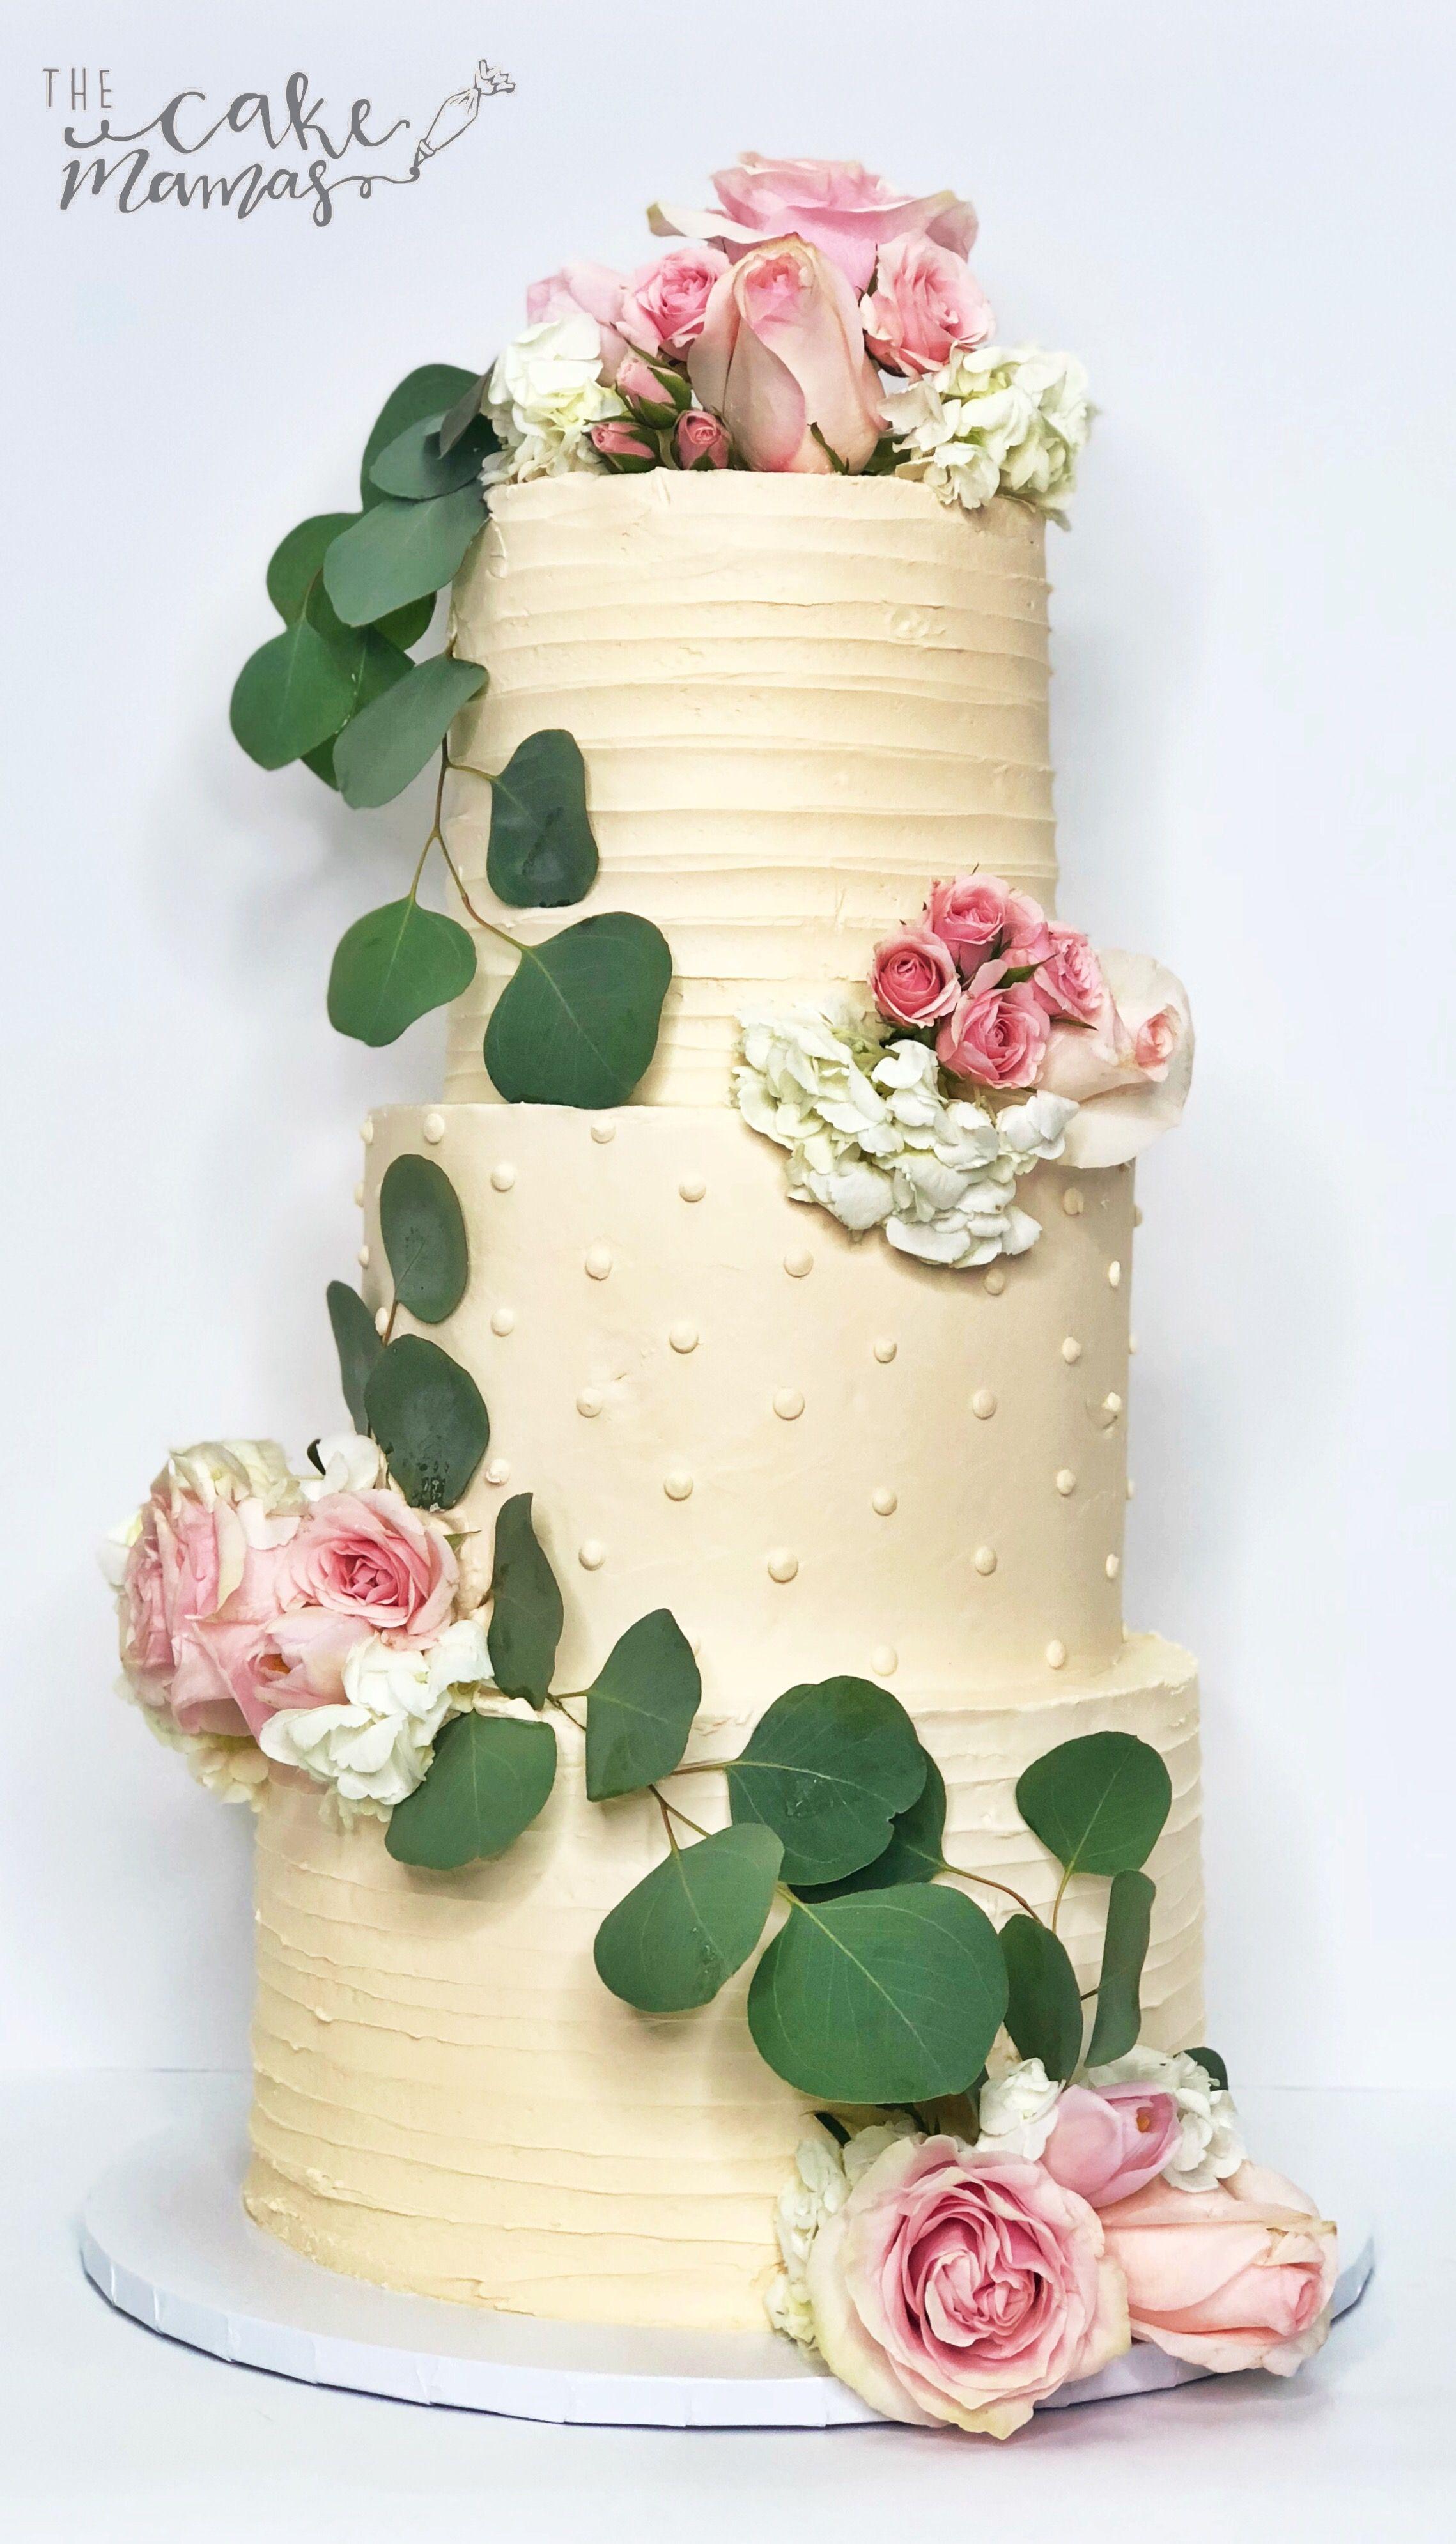 Textured ruffle and polka dot simple buttercream wedding